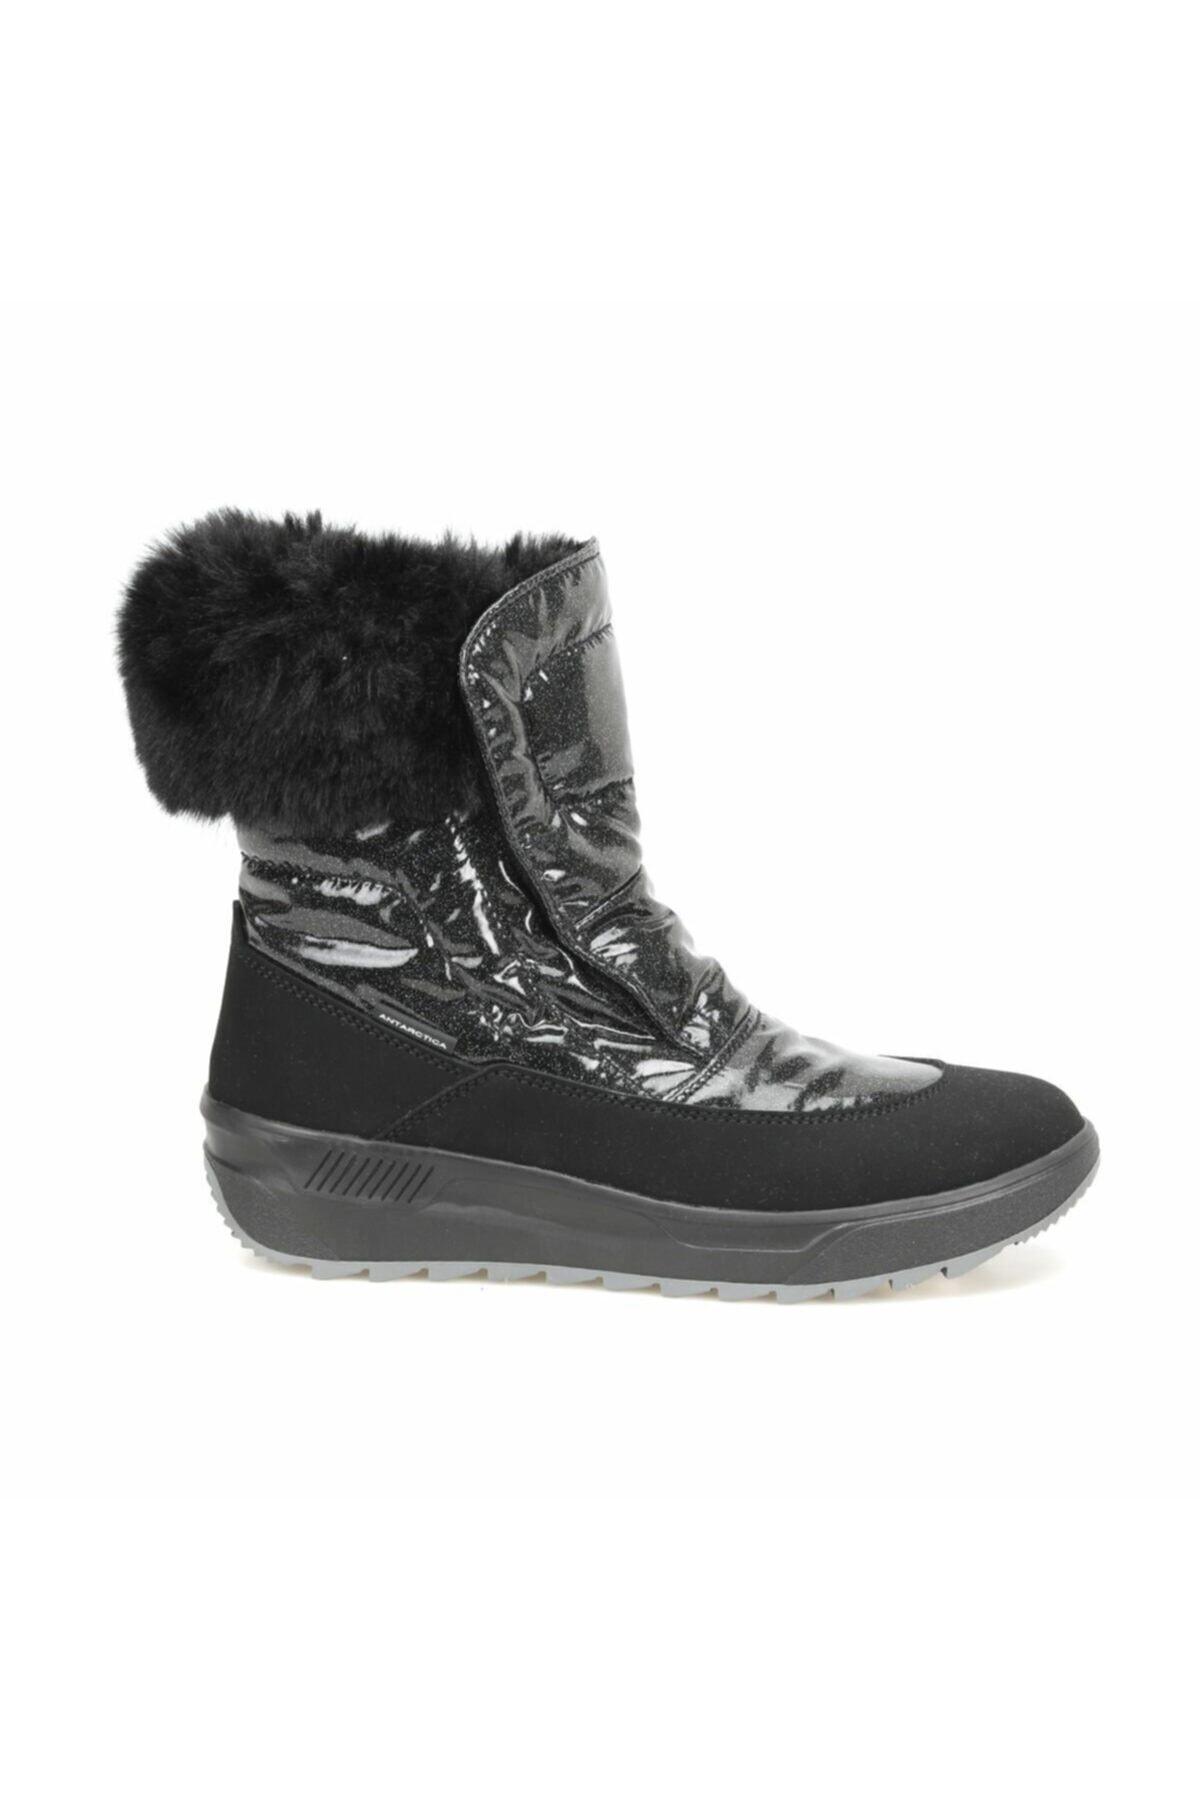 Antarctica 4703 Siyah Kadın Kar Botu 100346303 2